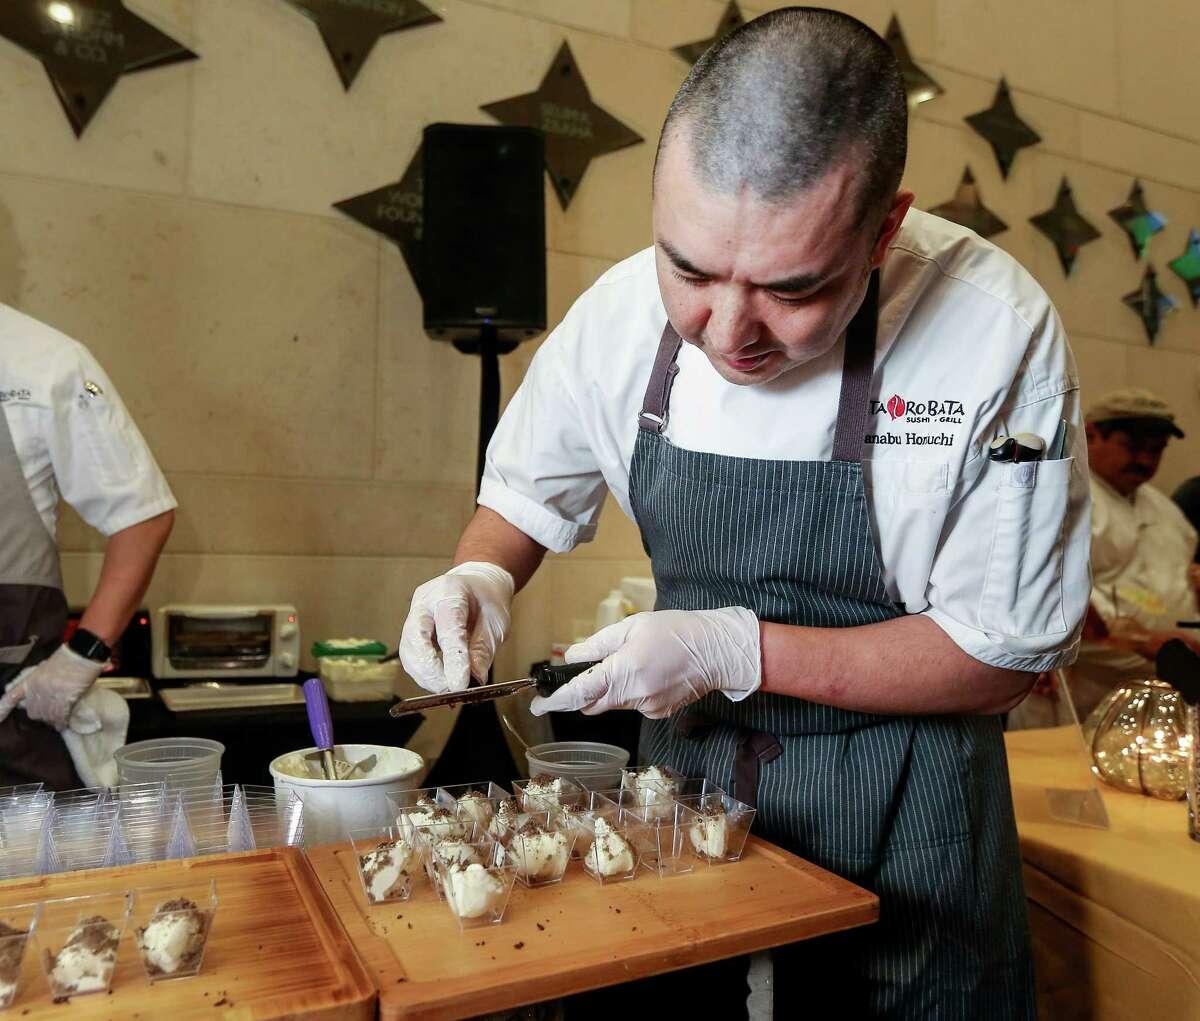 Manabu Horiuchi, executive chef of Kata Robata, won the competition with his honey truffle ice cream.